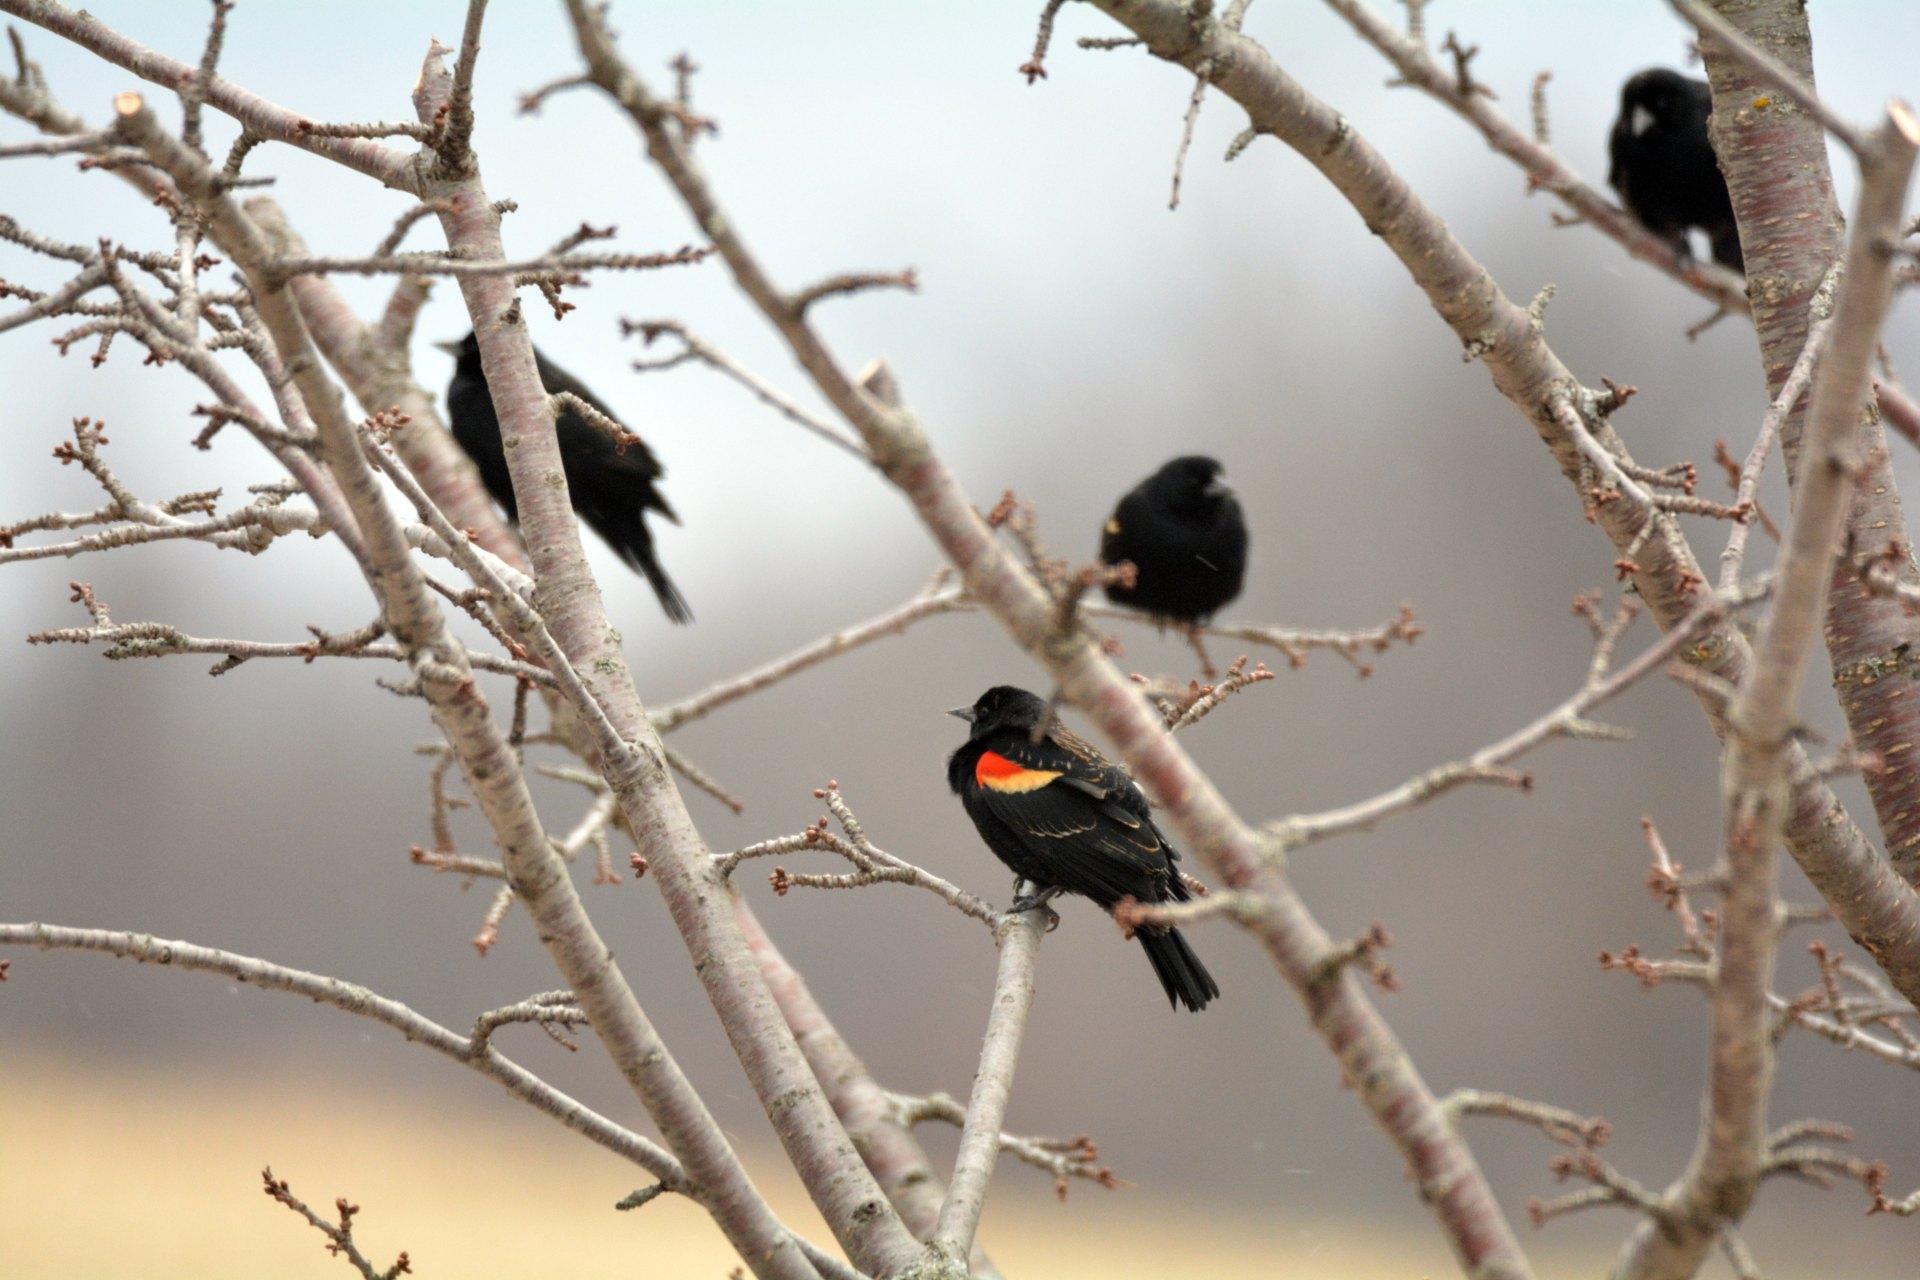 tony-fortunato-595062-unsplash iwannabealady.com birds poop on cars